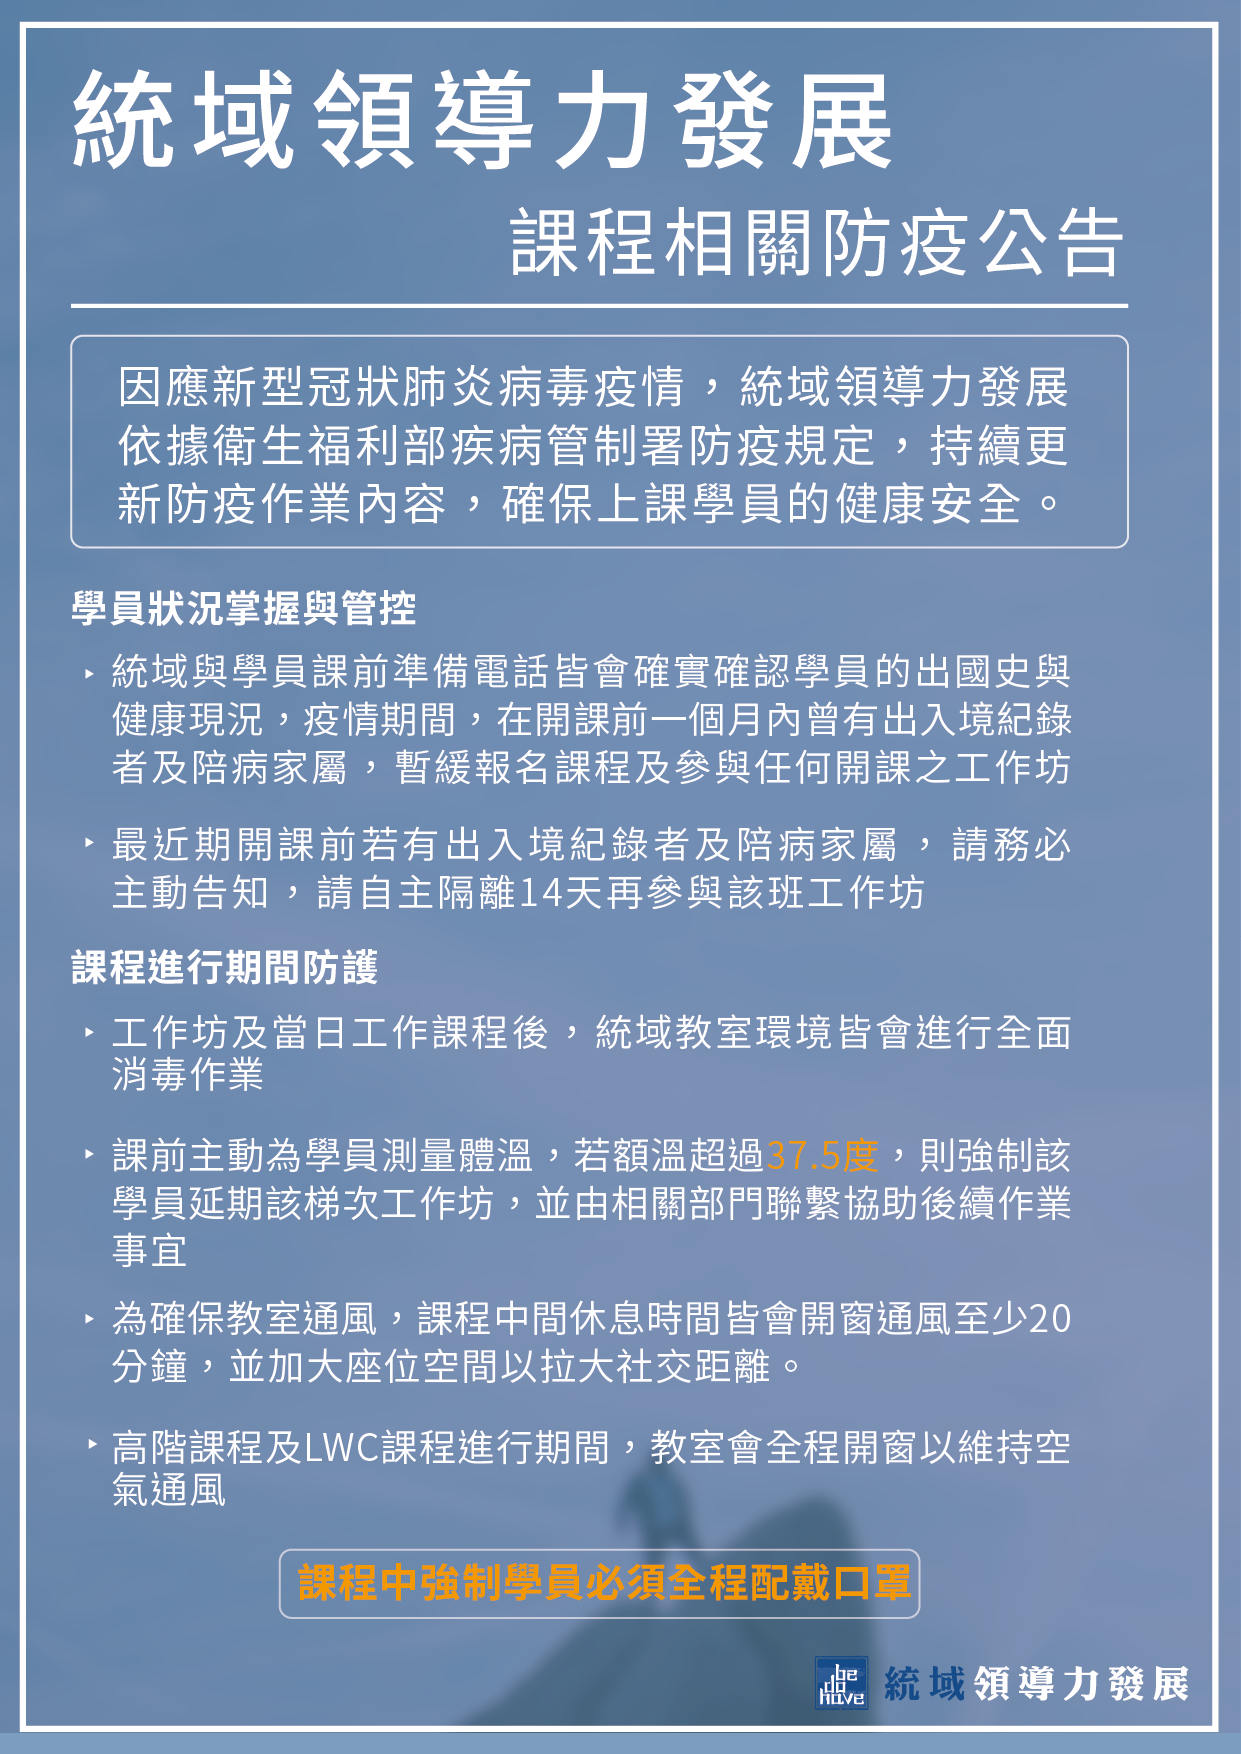 防疫公告3-01